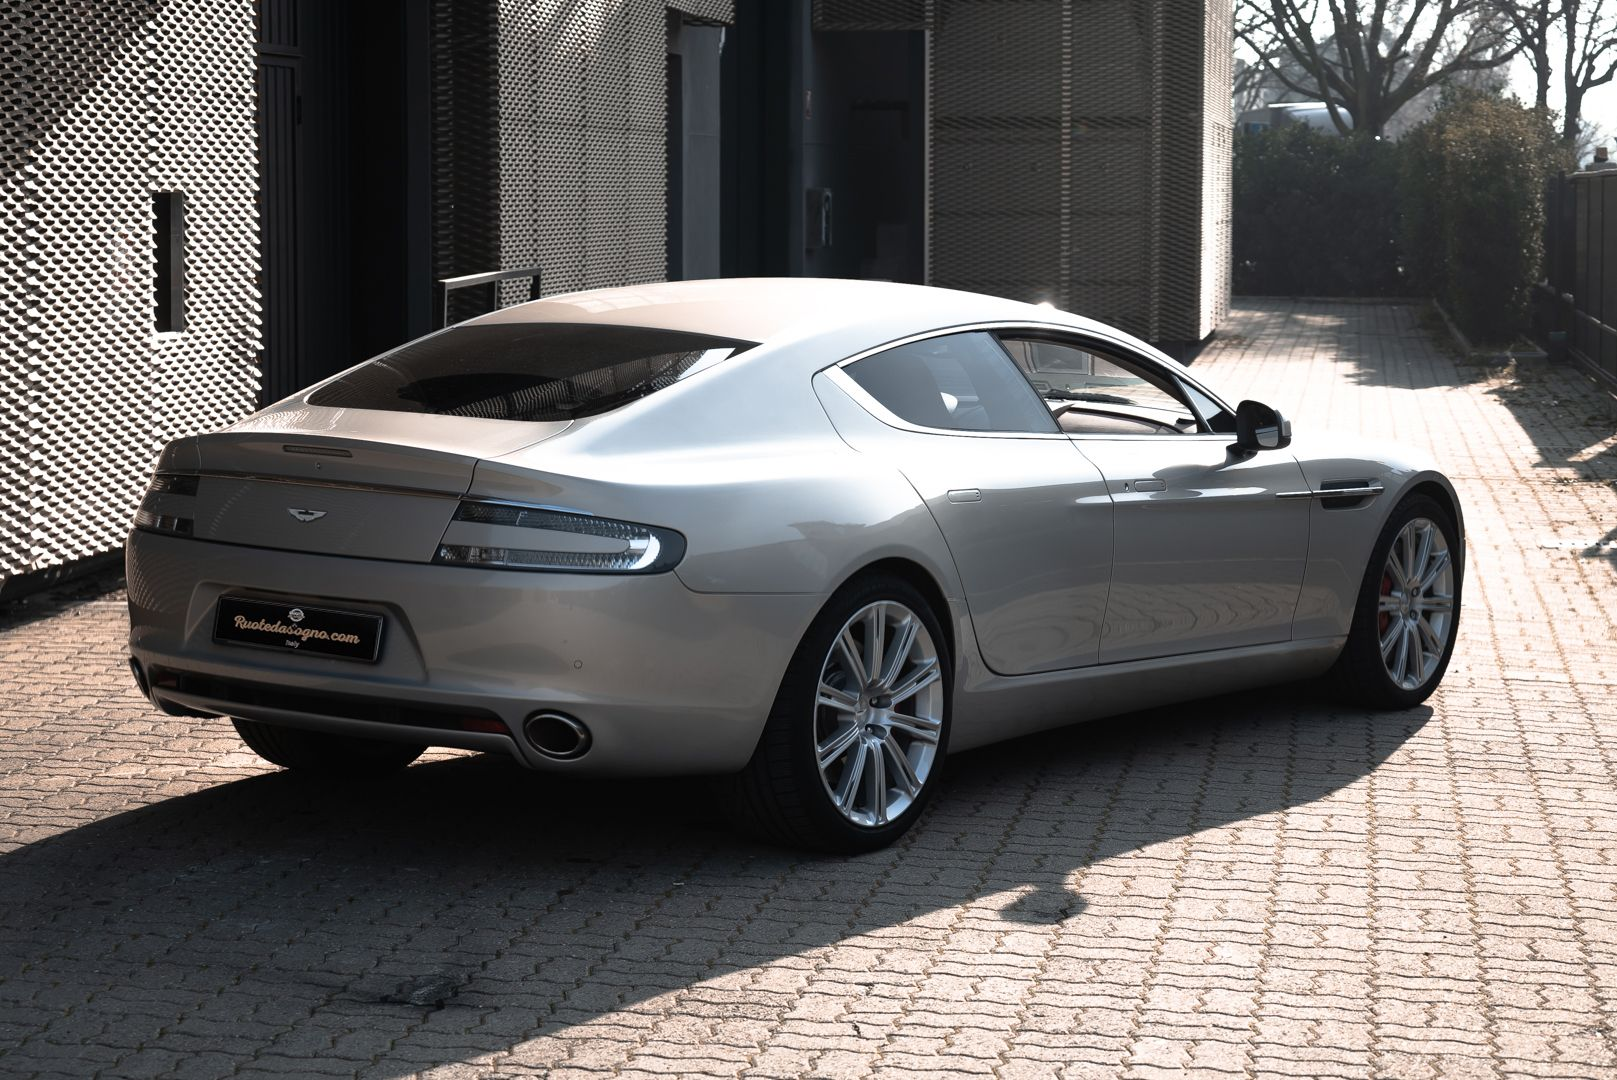 2010 Aston Martin Rapide 6.0 V12 62612